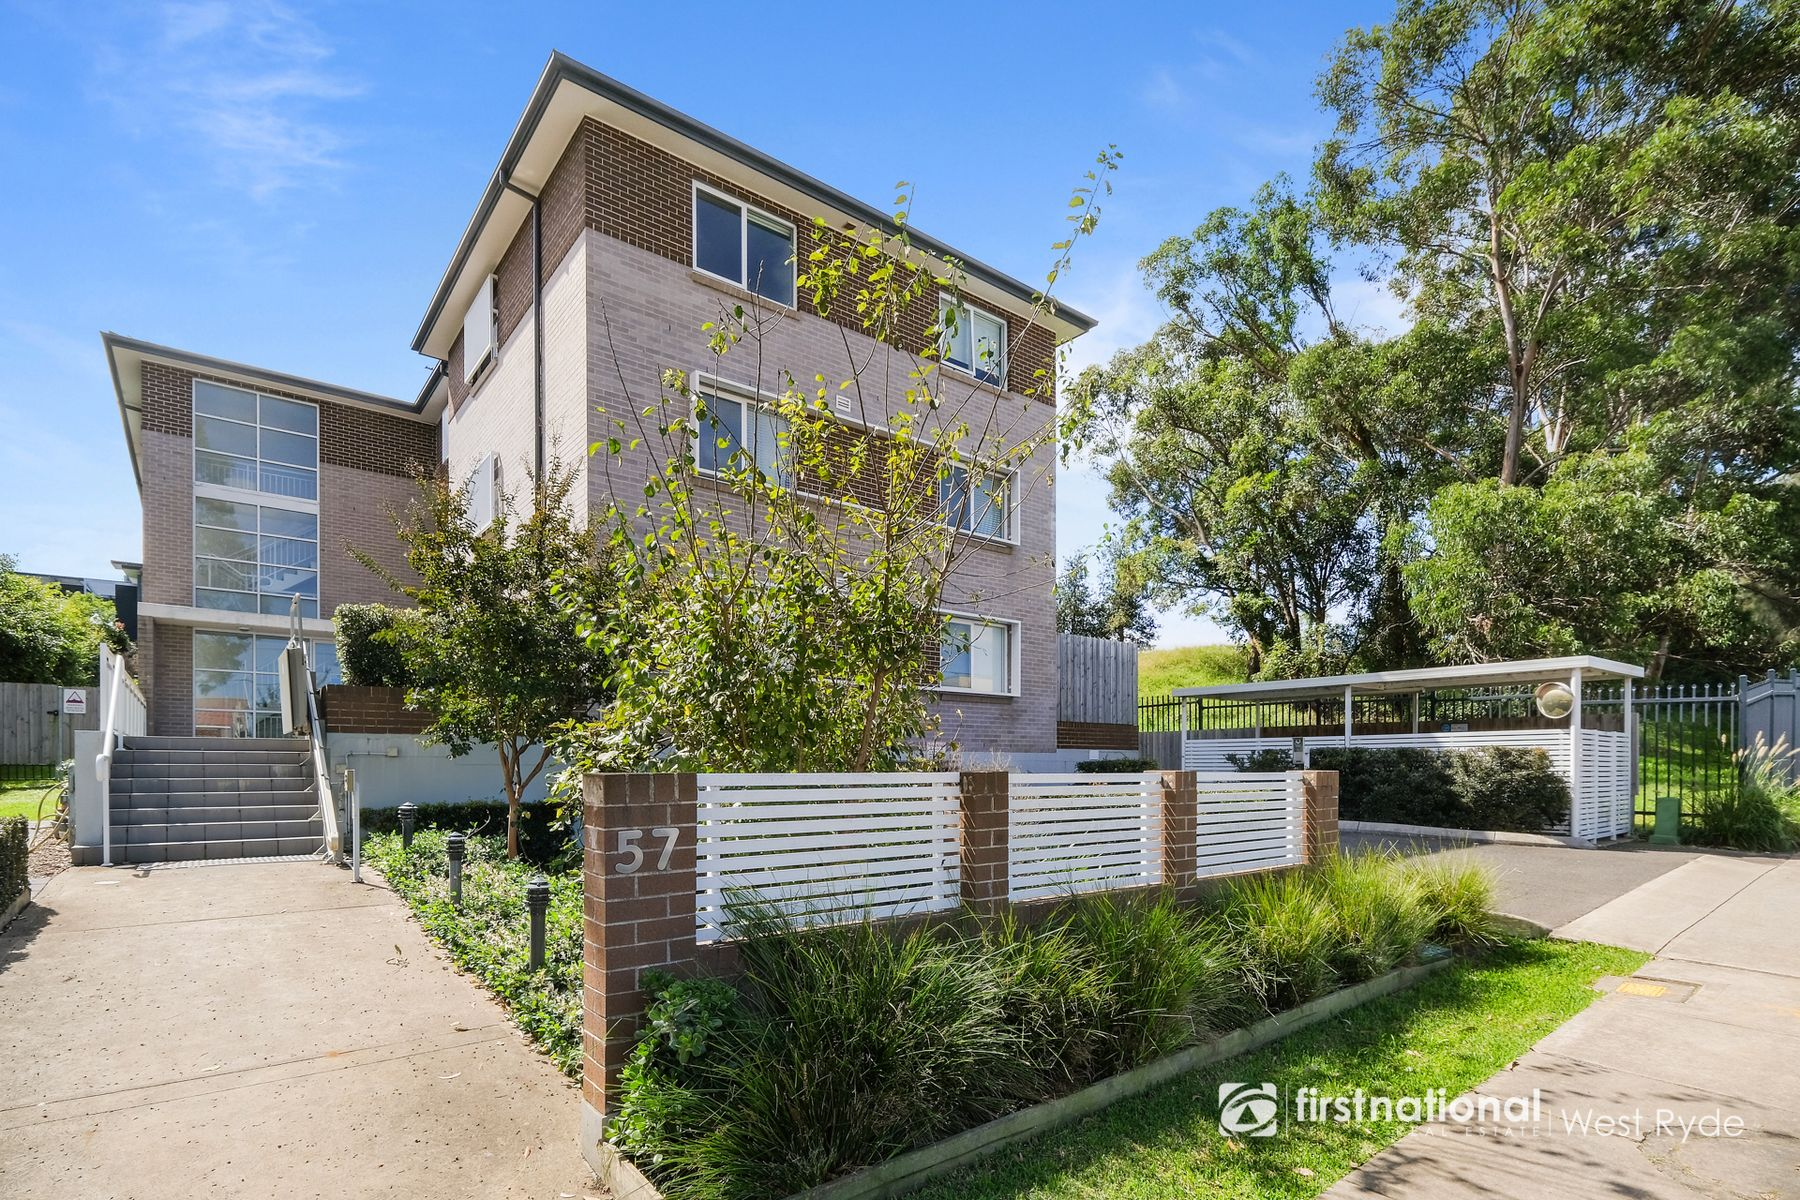 5/57 South Street, Rydalmere, NSW 2116